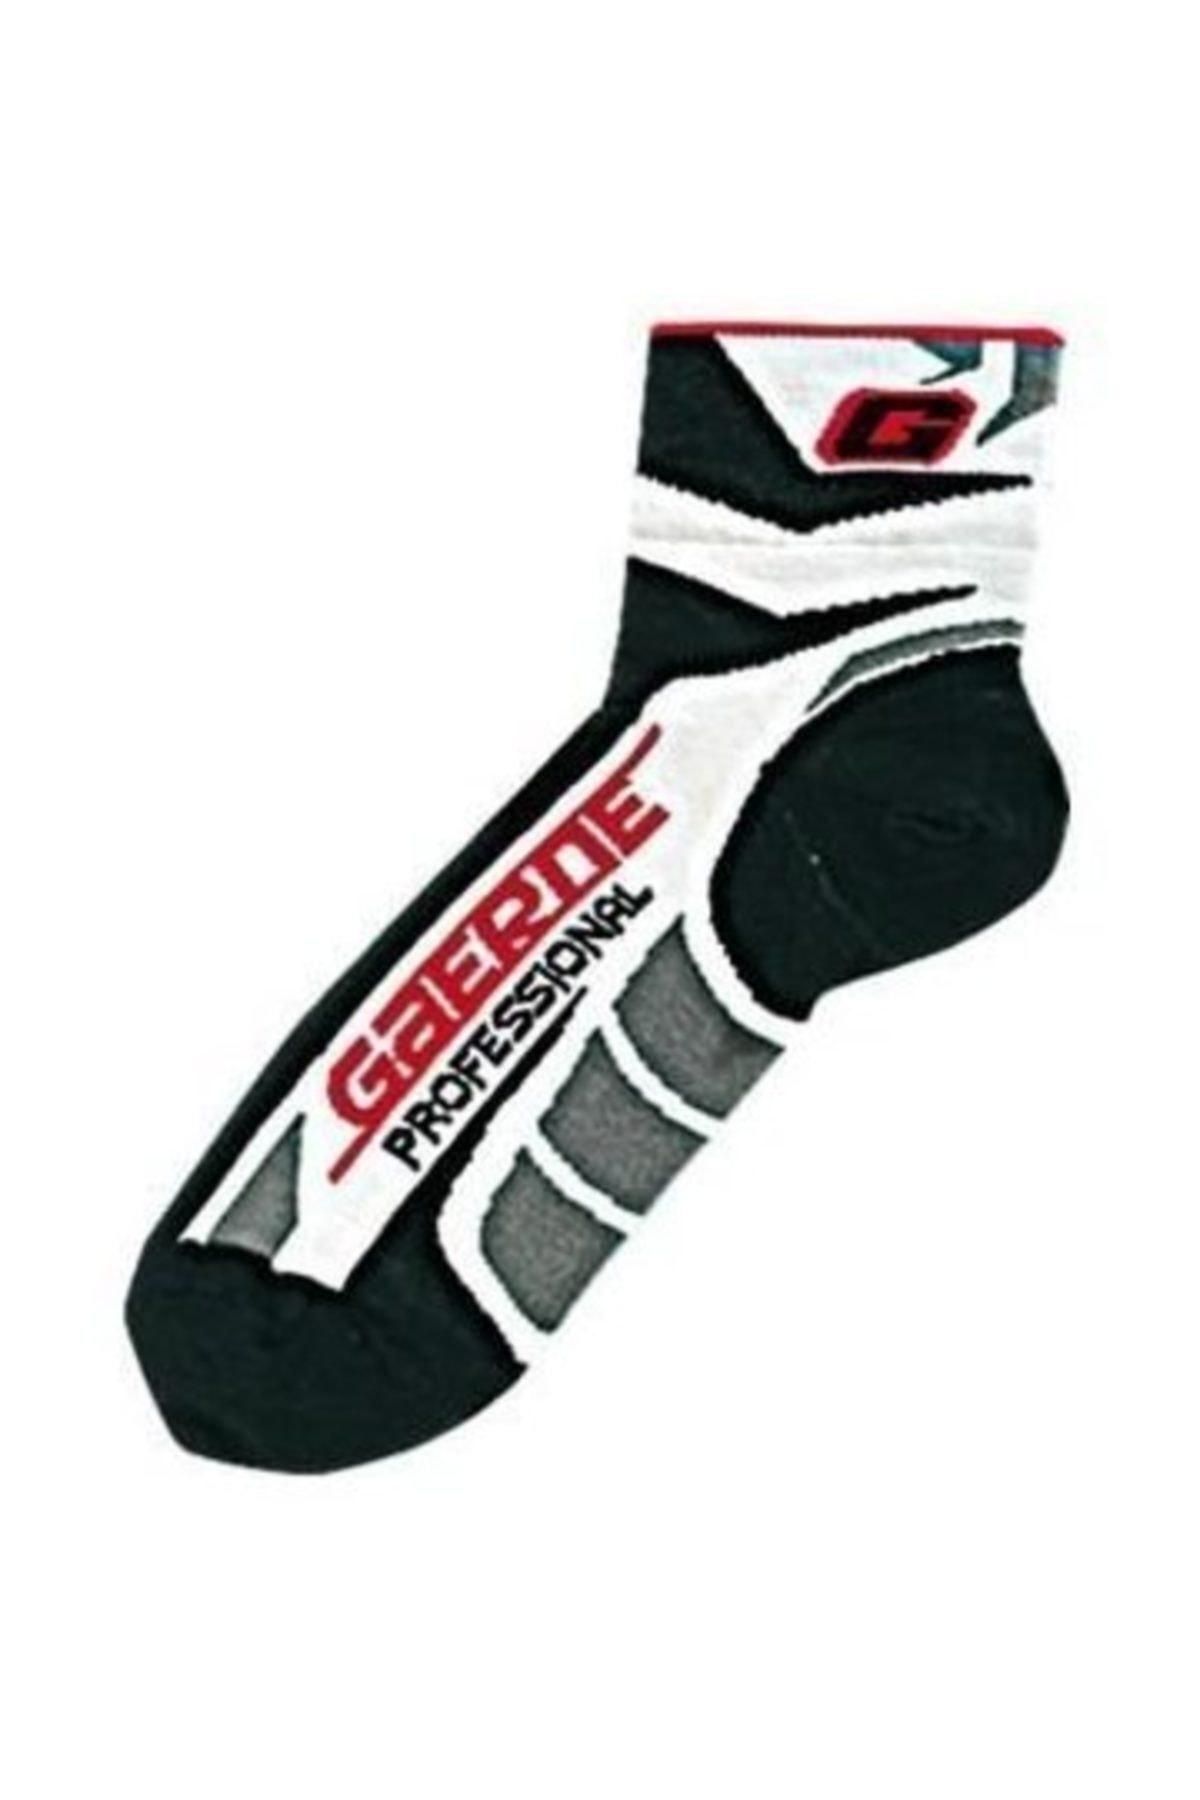 G.cycling Bisiklet Çorabı 4167-001 36-39 Numara